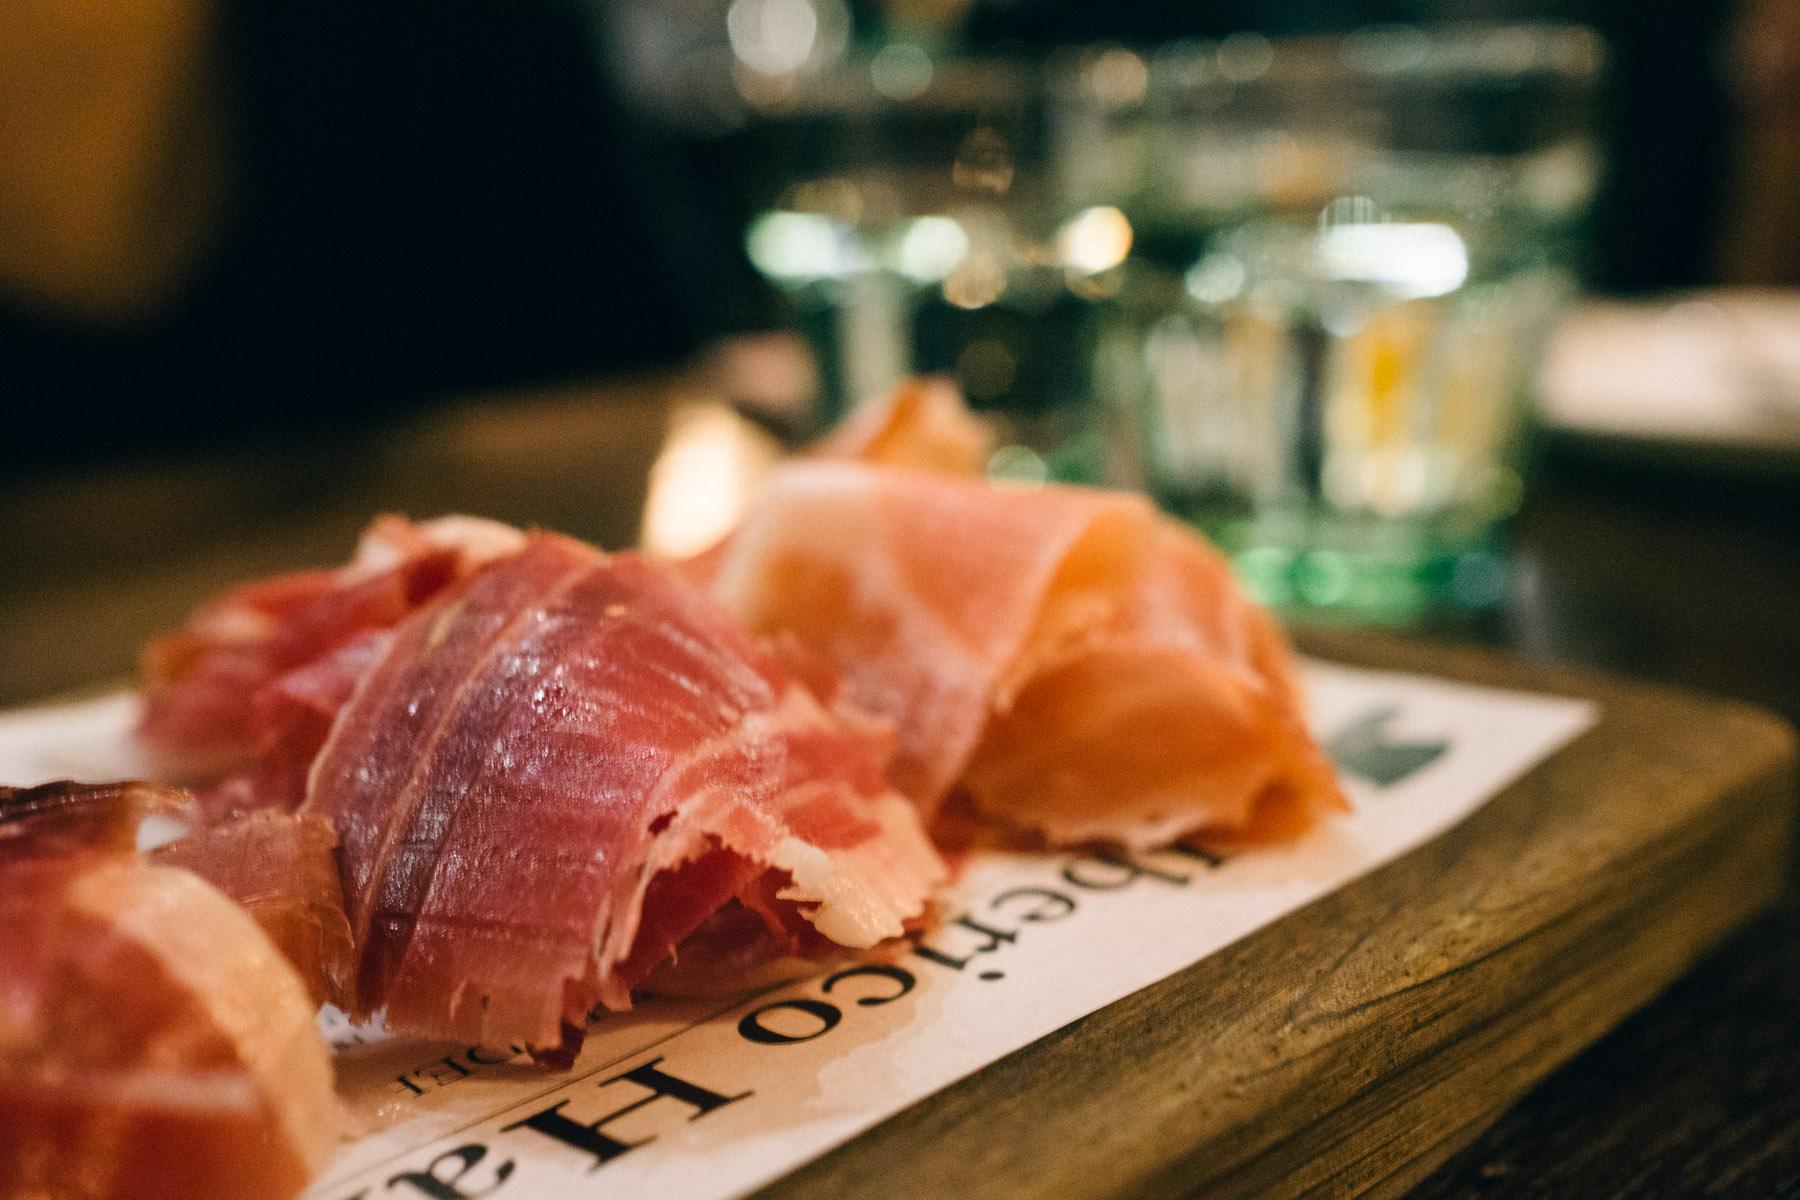 ham-and-sherry-spanish-tapas-ship-street-wan-chai-hong-kong-jason-atherton-9